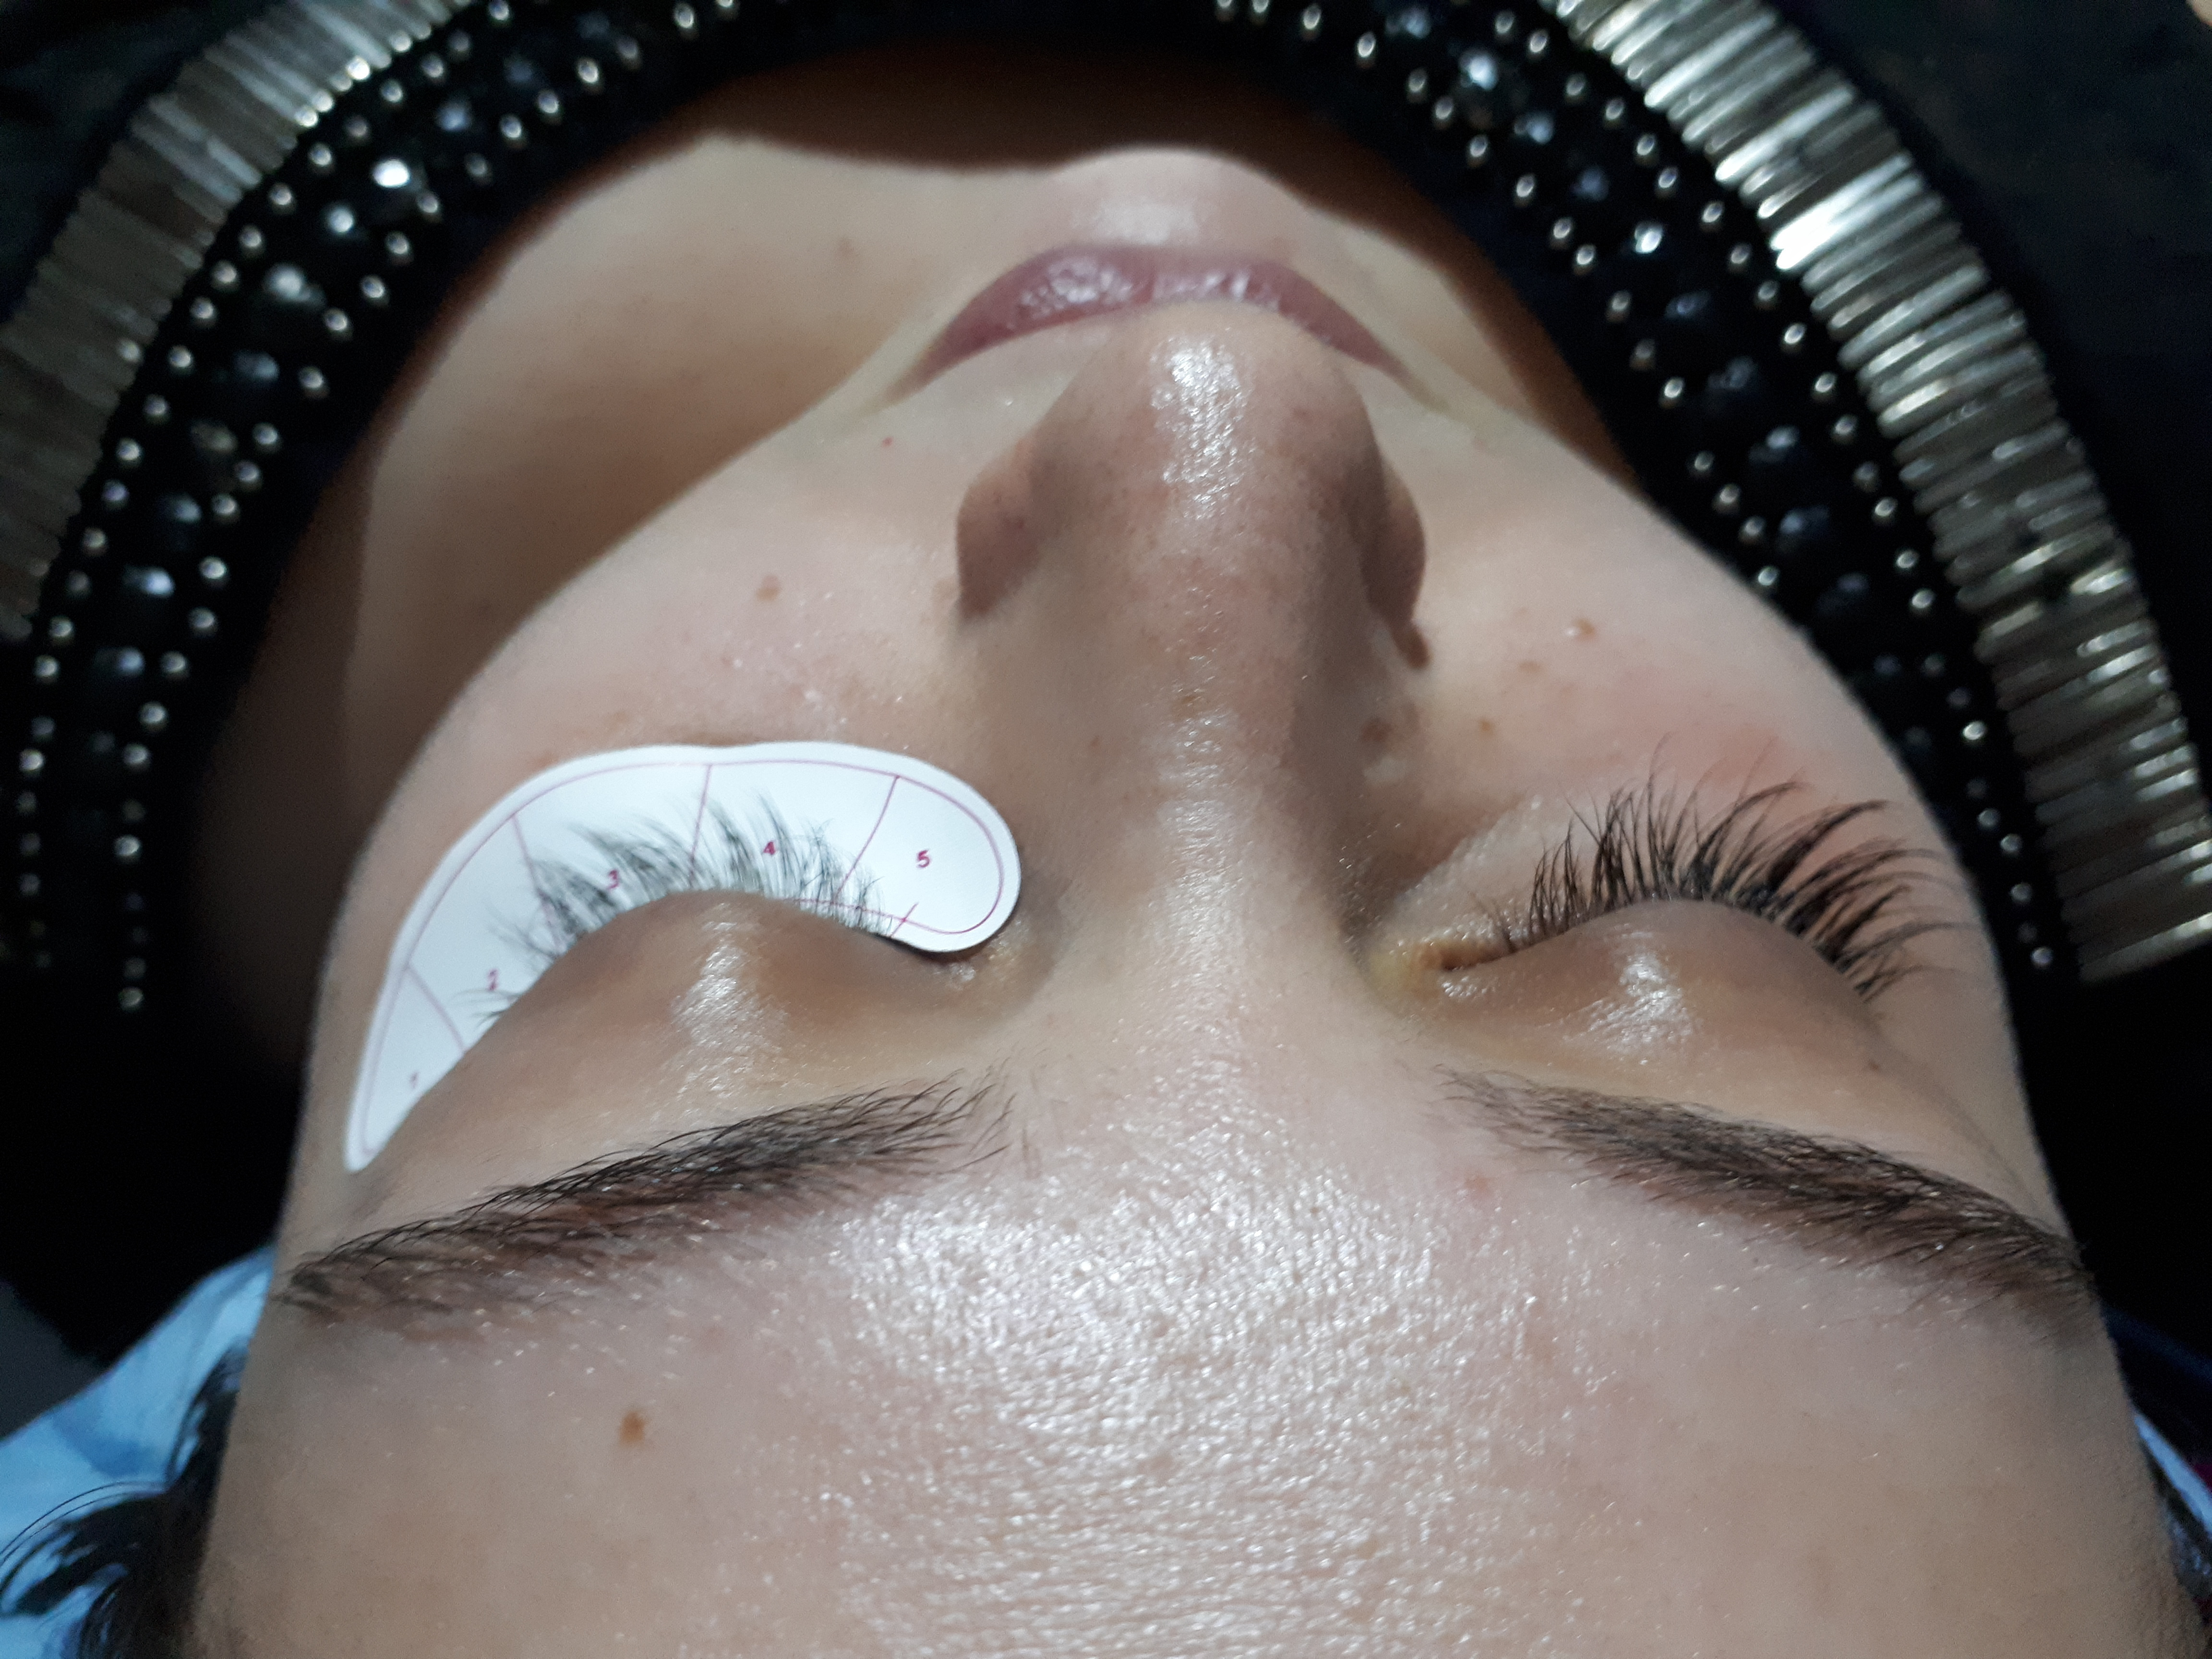 esteticista estudante (esteticista) designer de sobrancelhas massoterapeuta